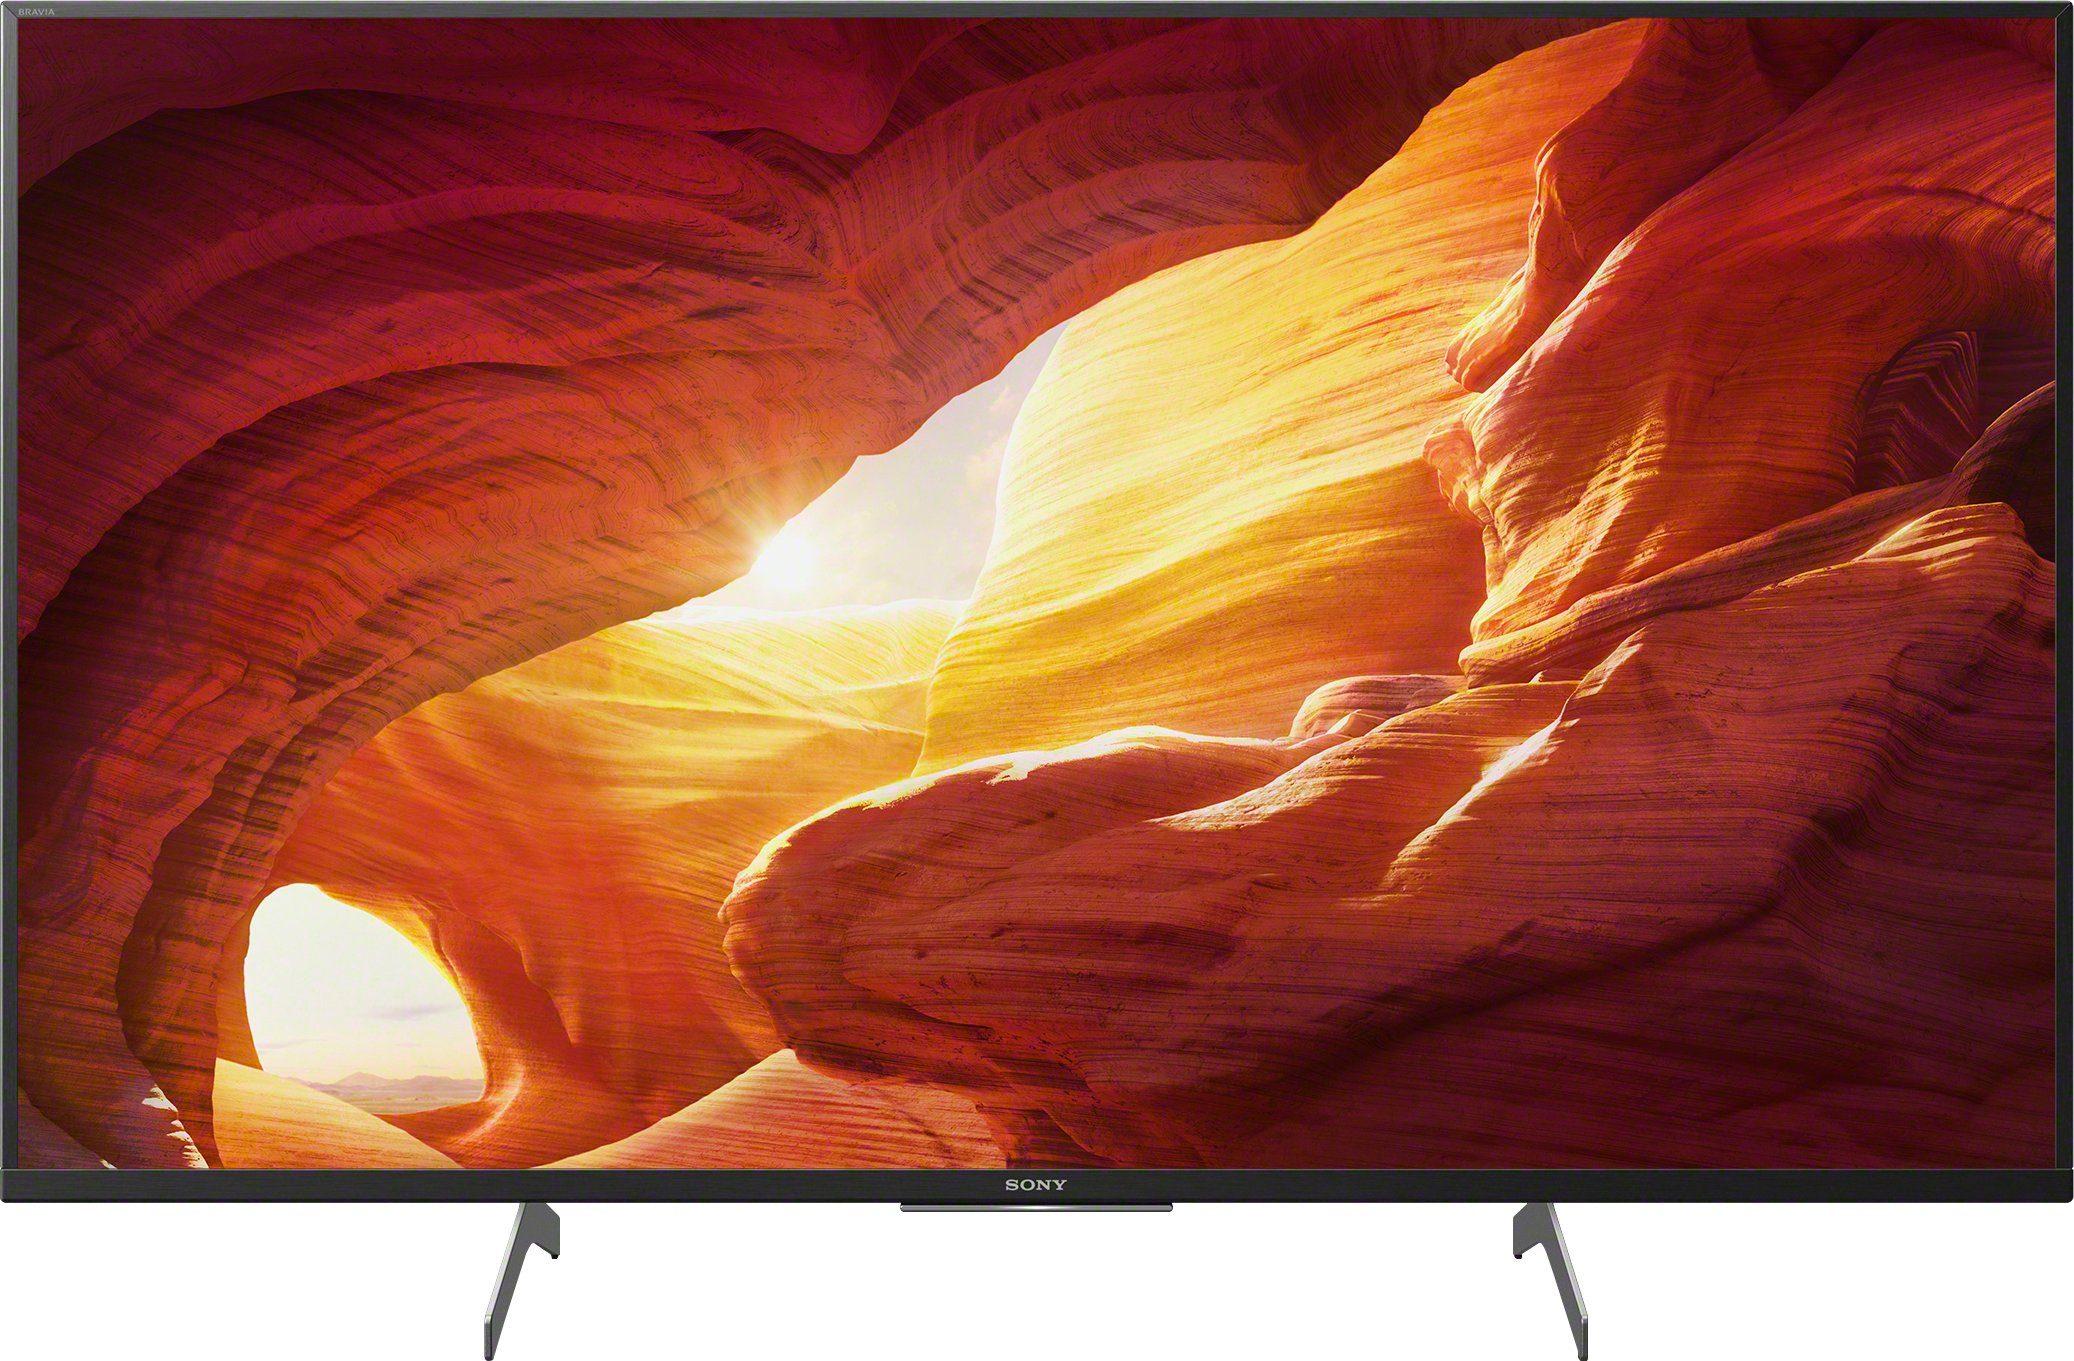 sony kd 43xh85xx lcd led fernseher 108 cm 43 zoll 4k ultra hd android tv smart tv